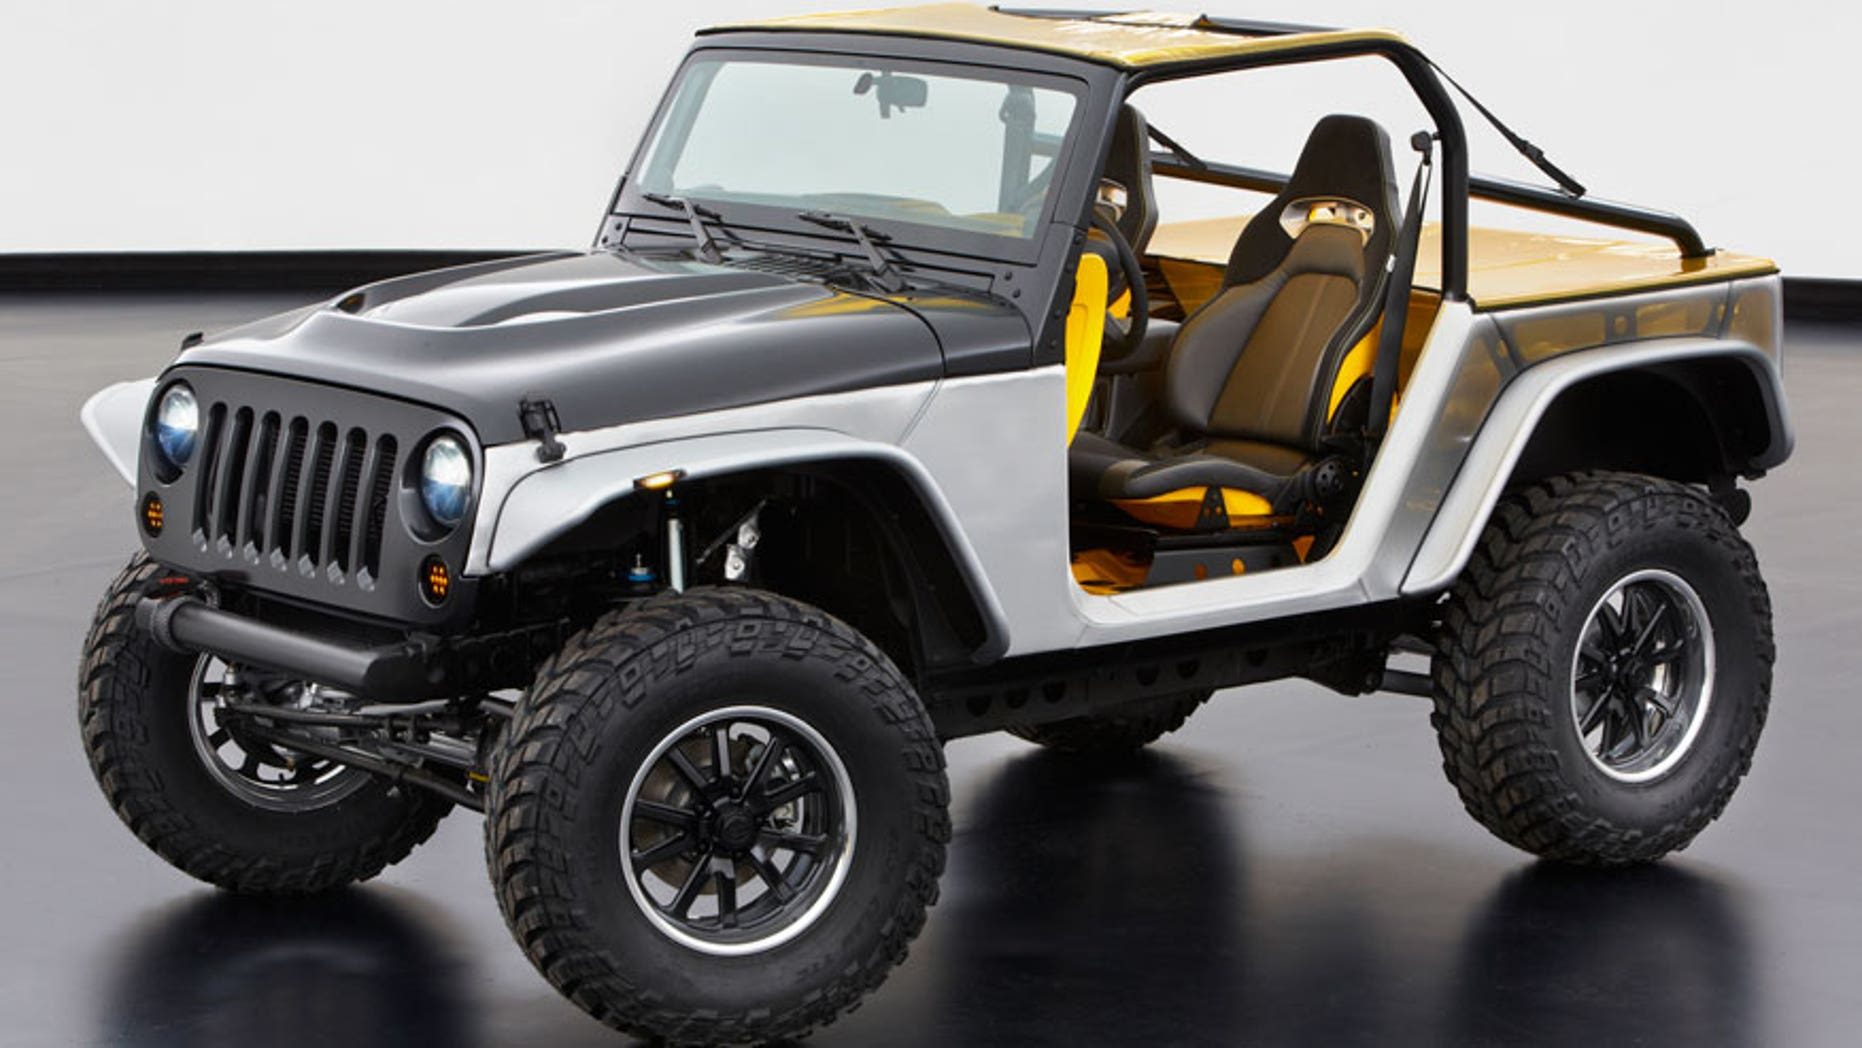 Jeep Wrangler Stitch concept